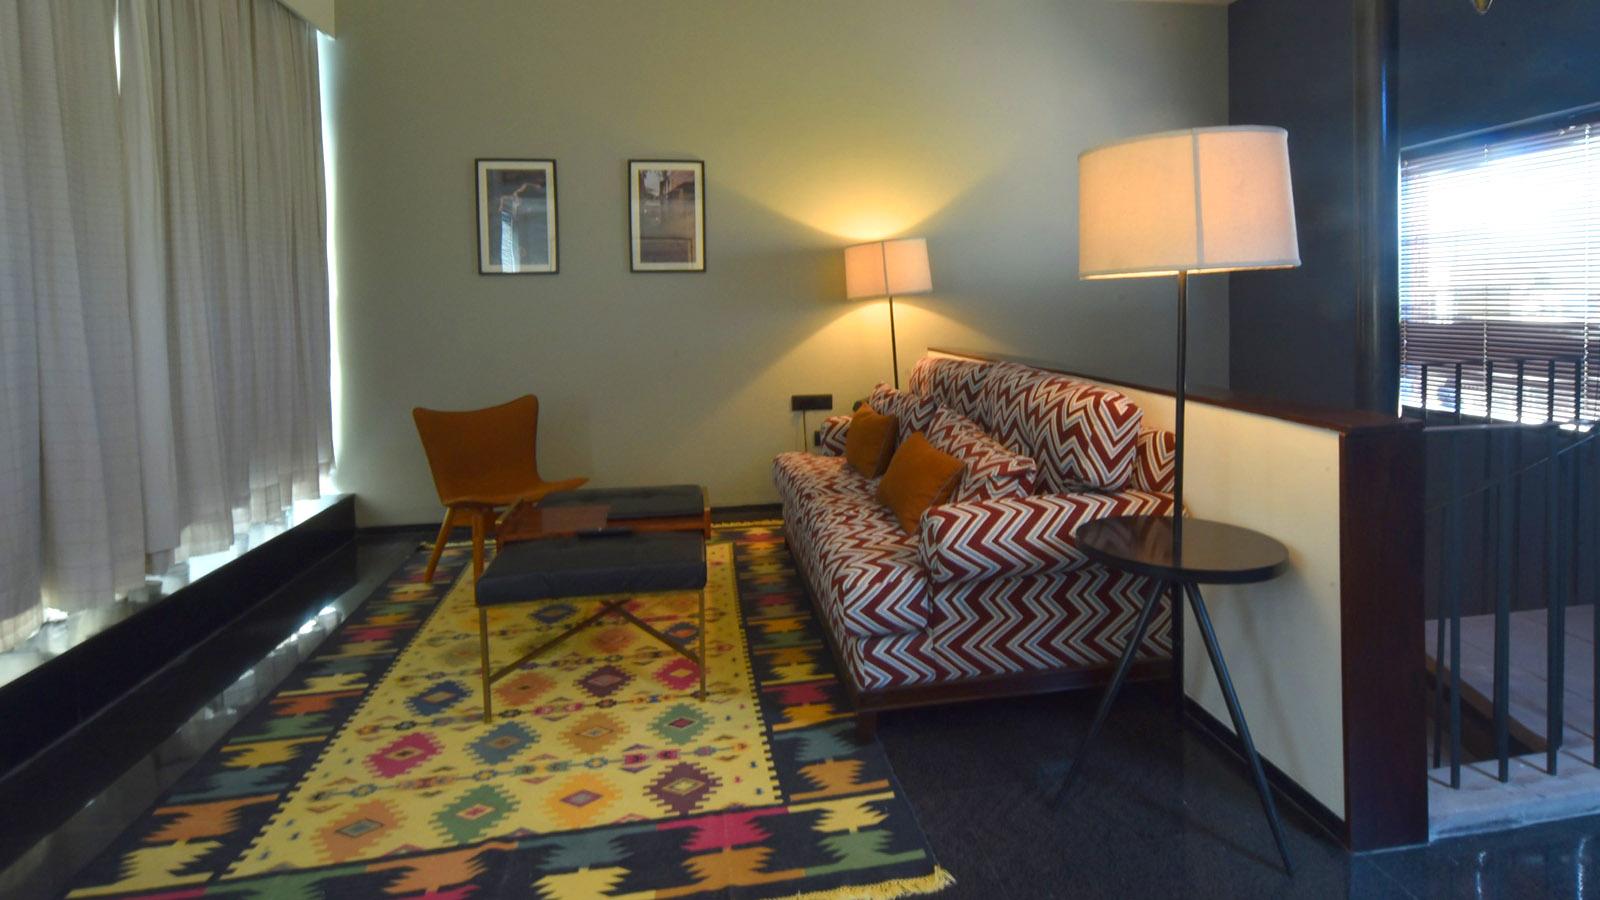 Duplex-Suite-RAAS-Hotel-Jodhpur-Rajasthan-03